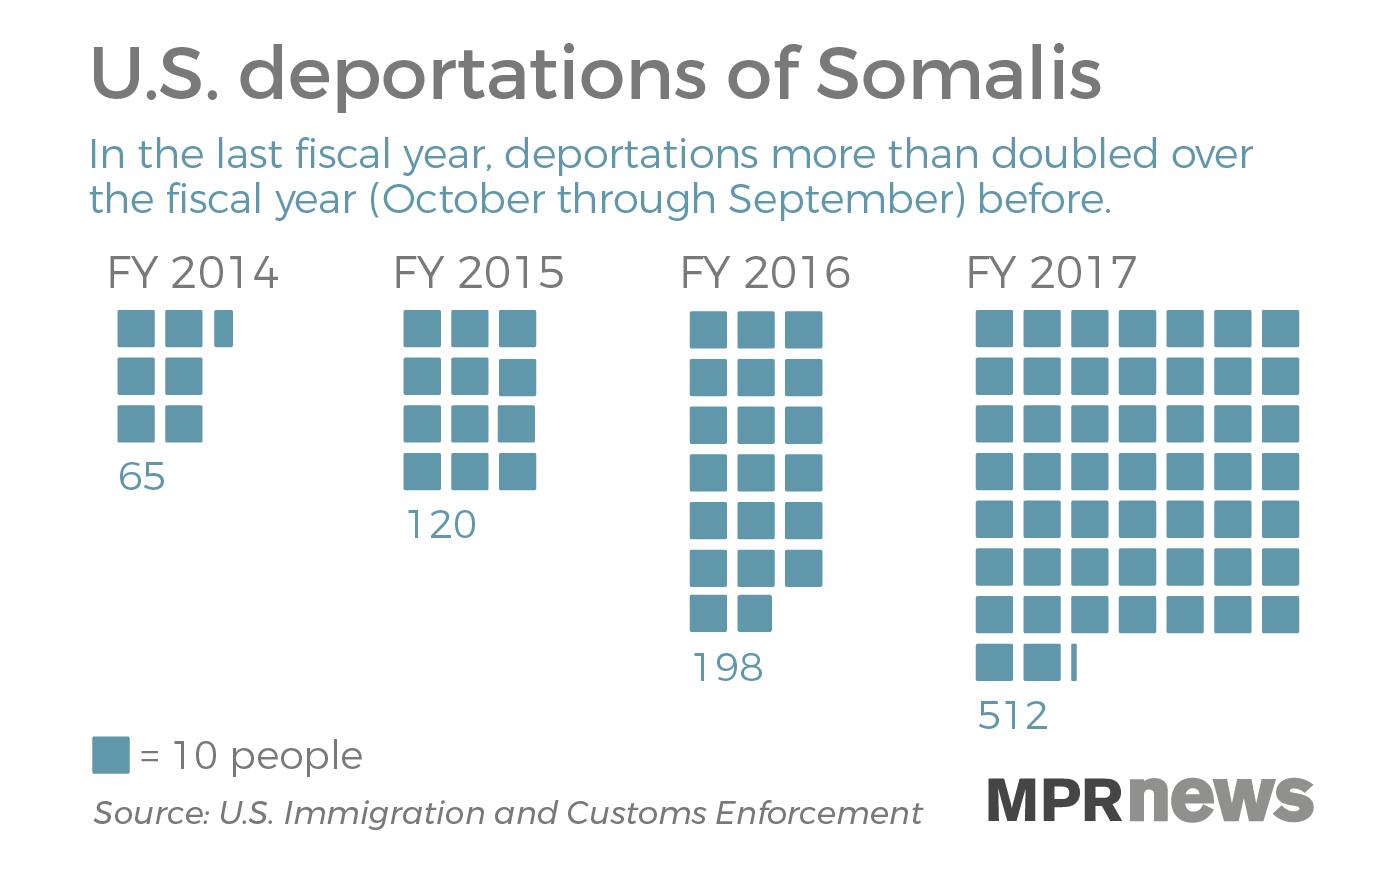 Somali deportation has been increasing